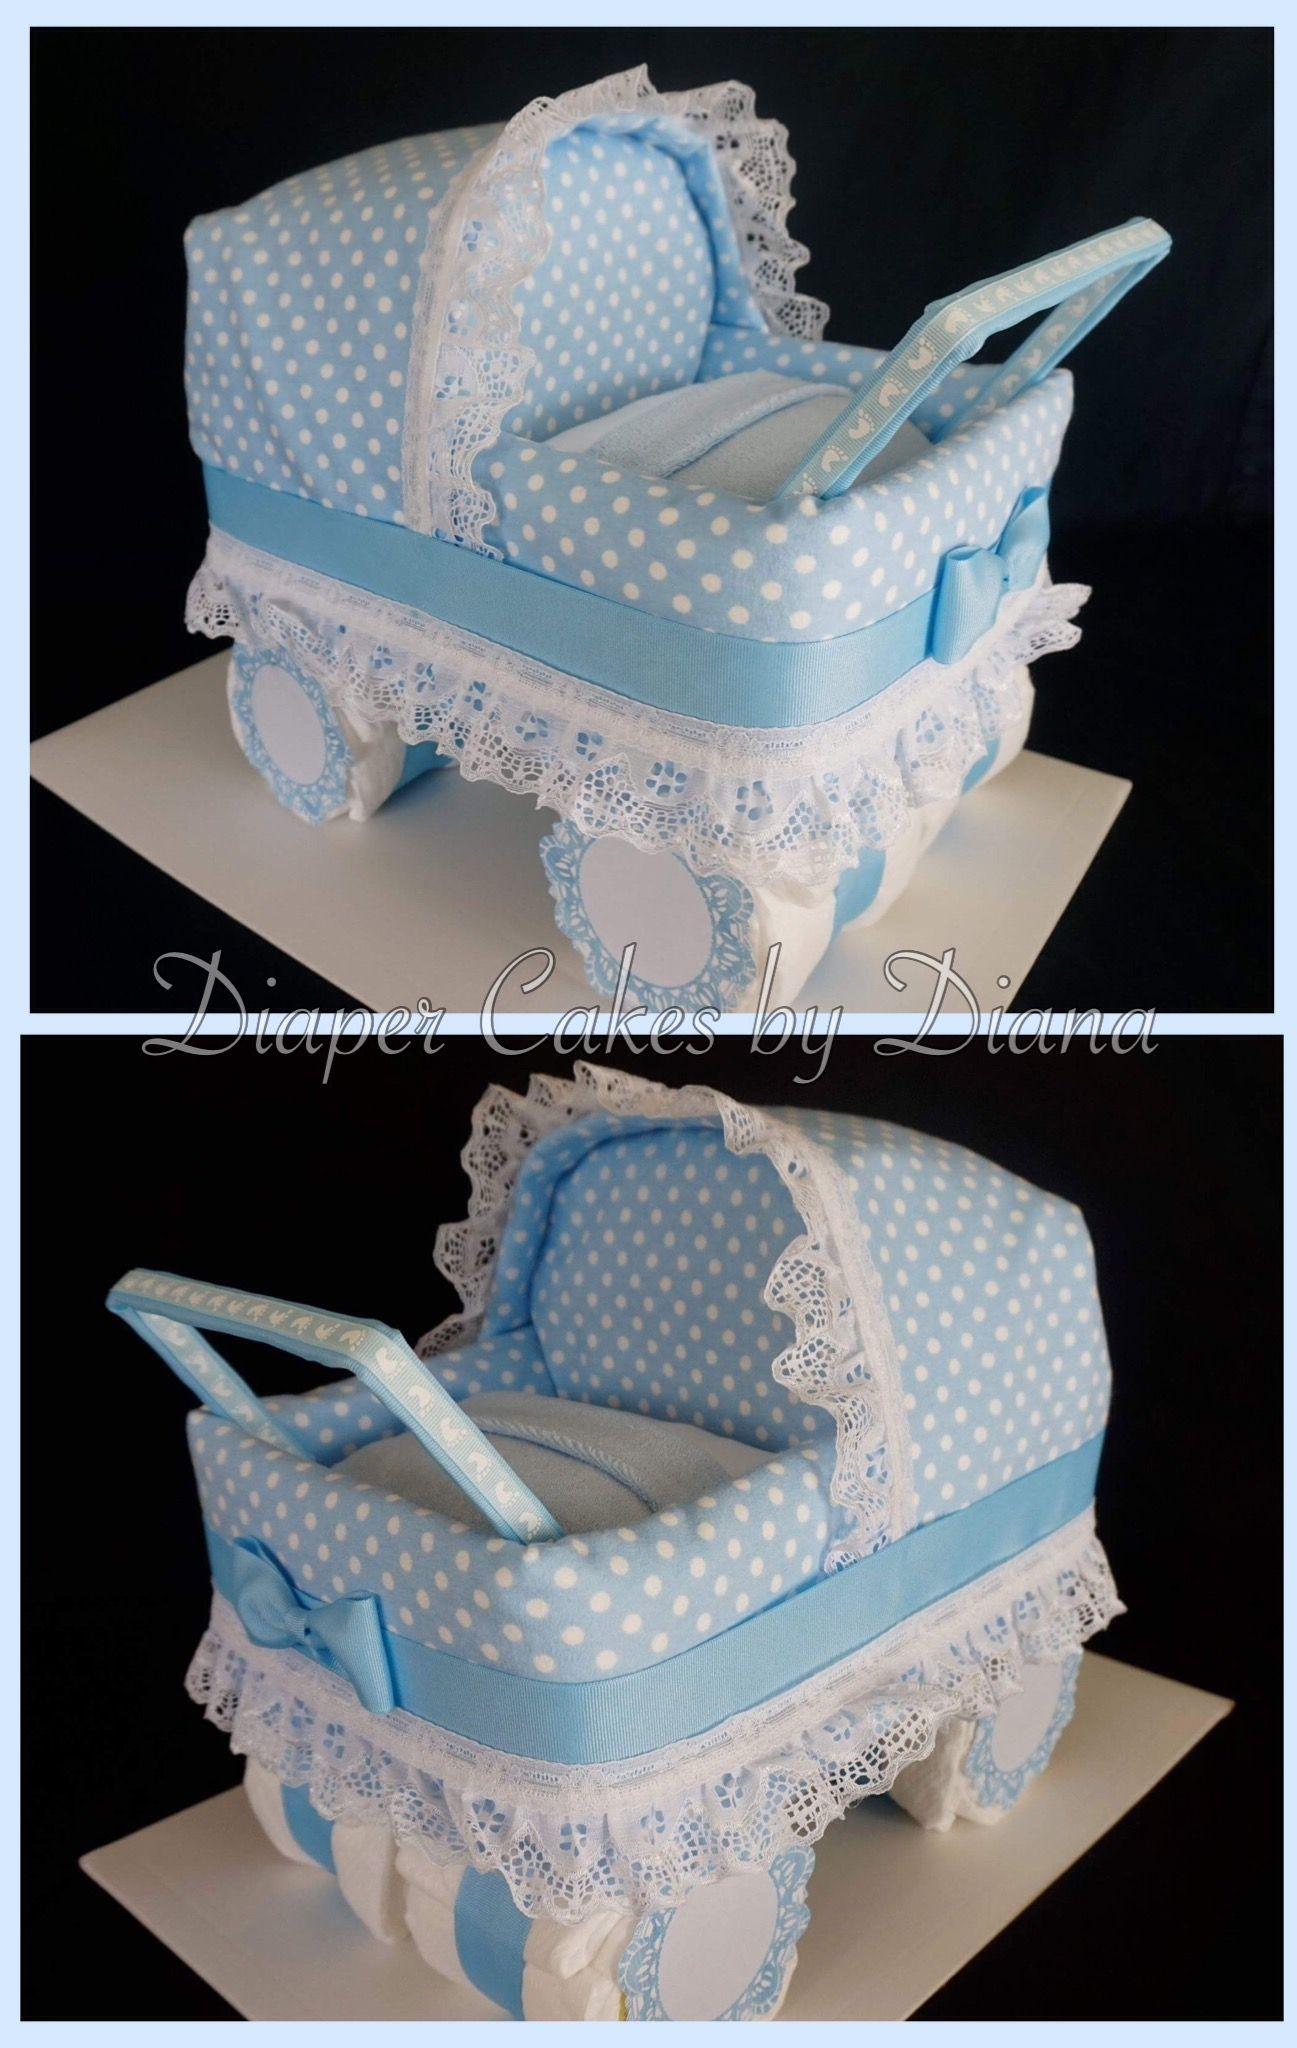 Baby Boy Carriage Diaper Cake wwwfacebookcomDiaperCakesbyDiana